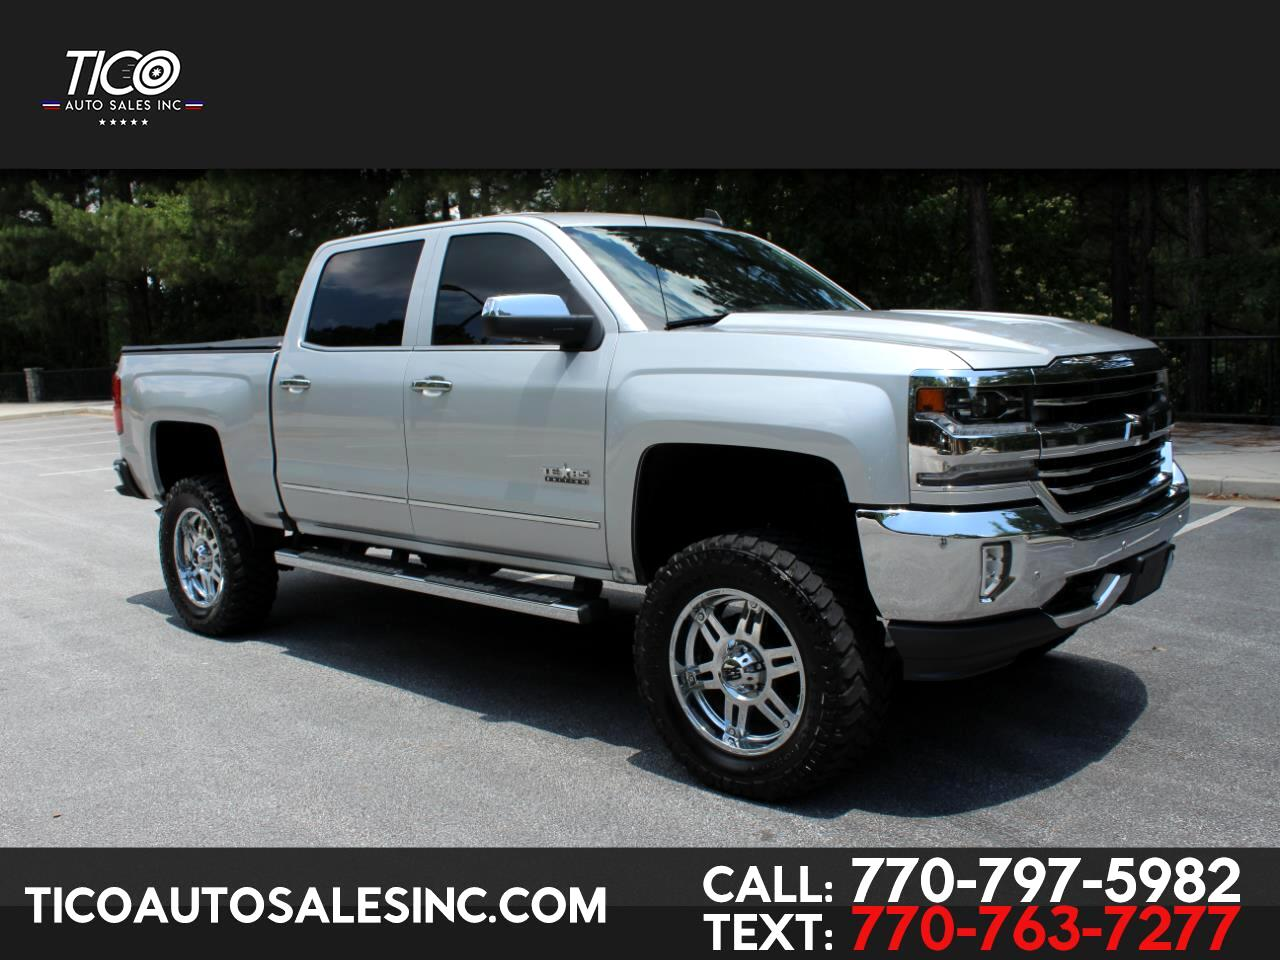 Used Cars for Sale Peachtree Corners GA 30071 Tico Auto Sales